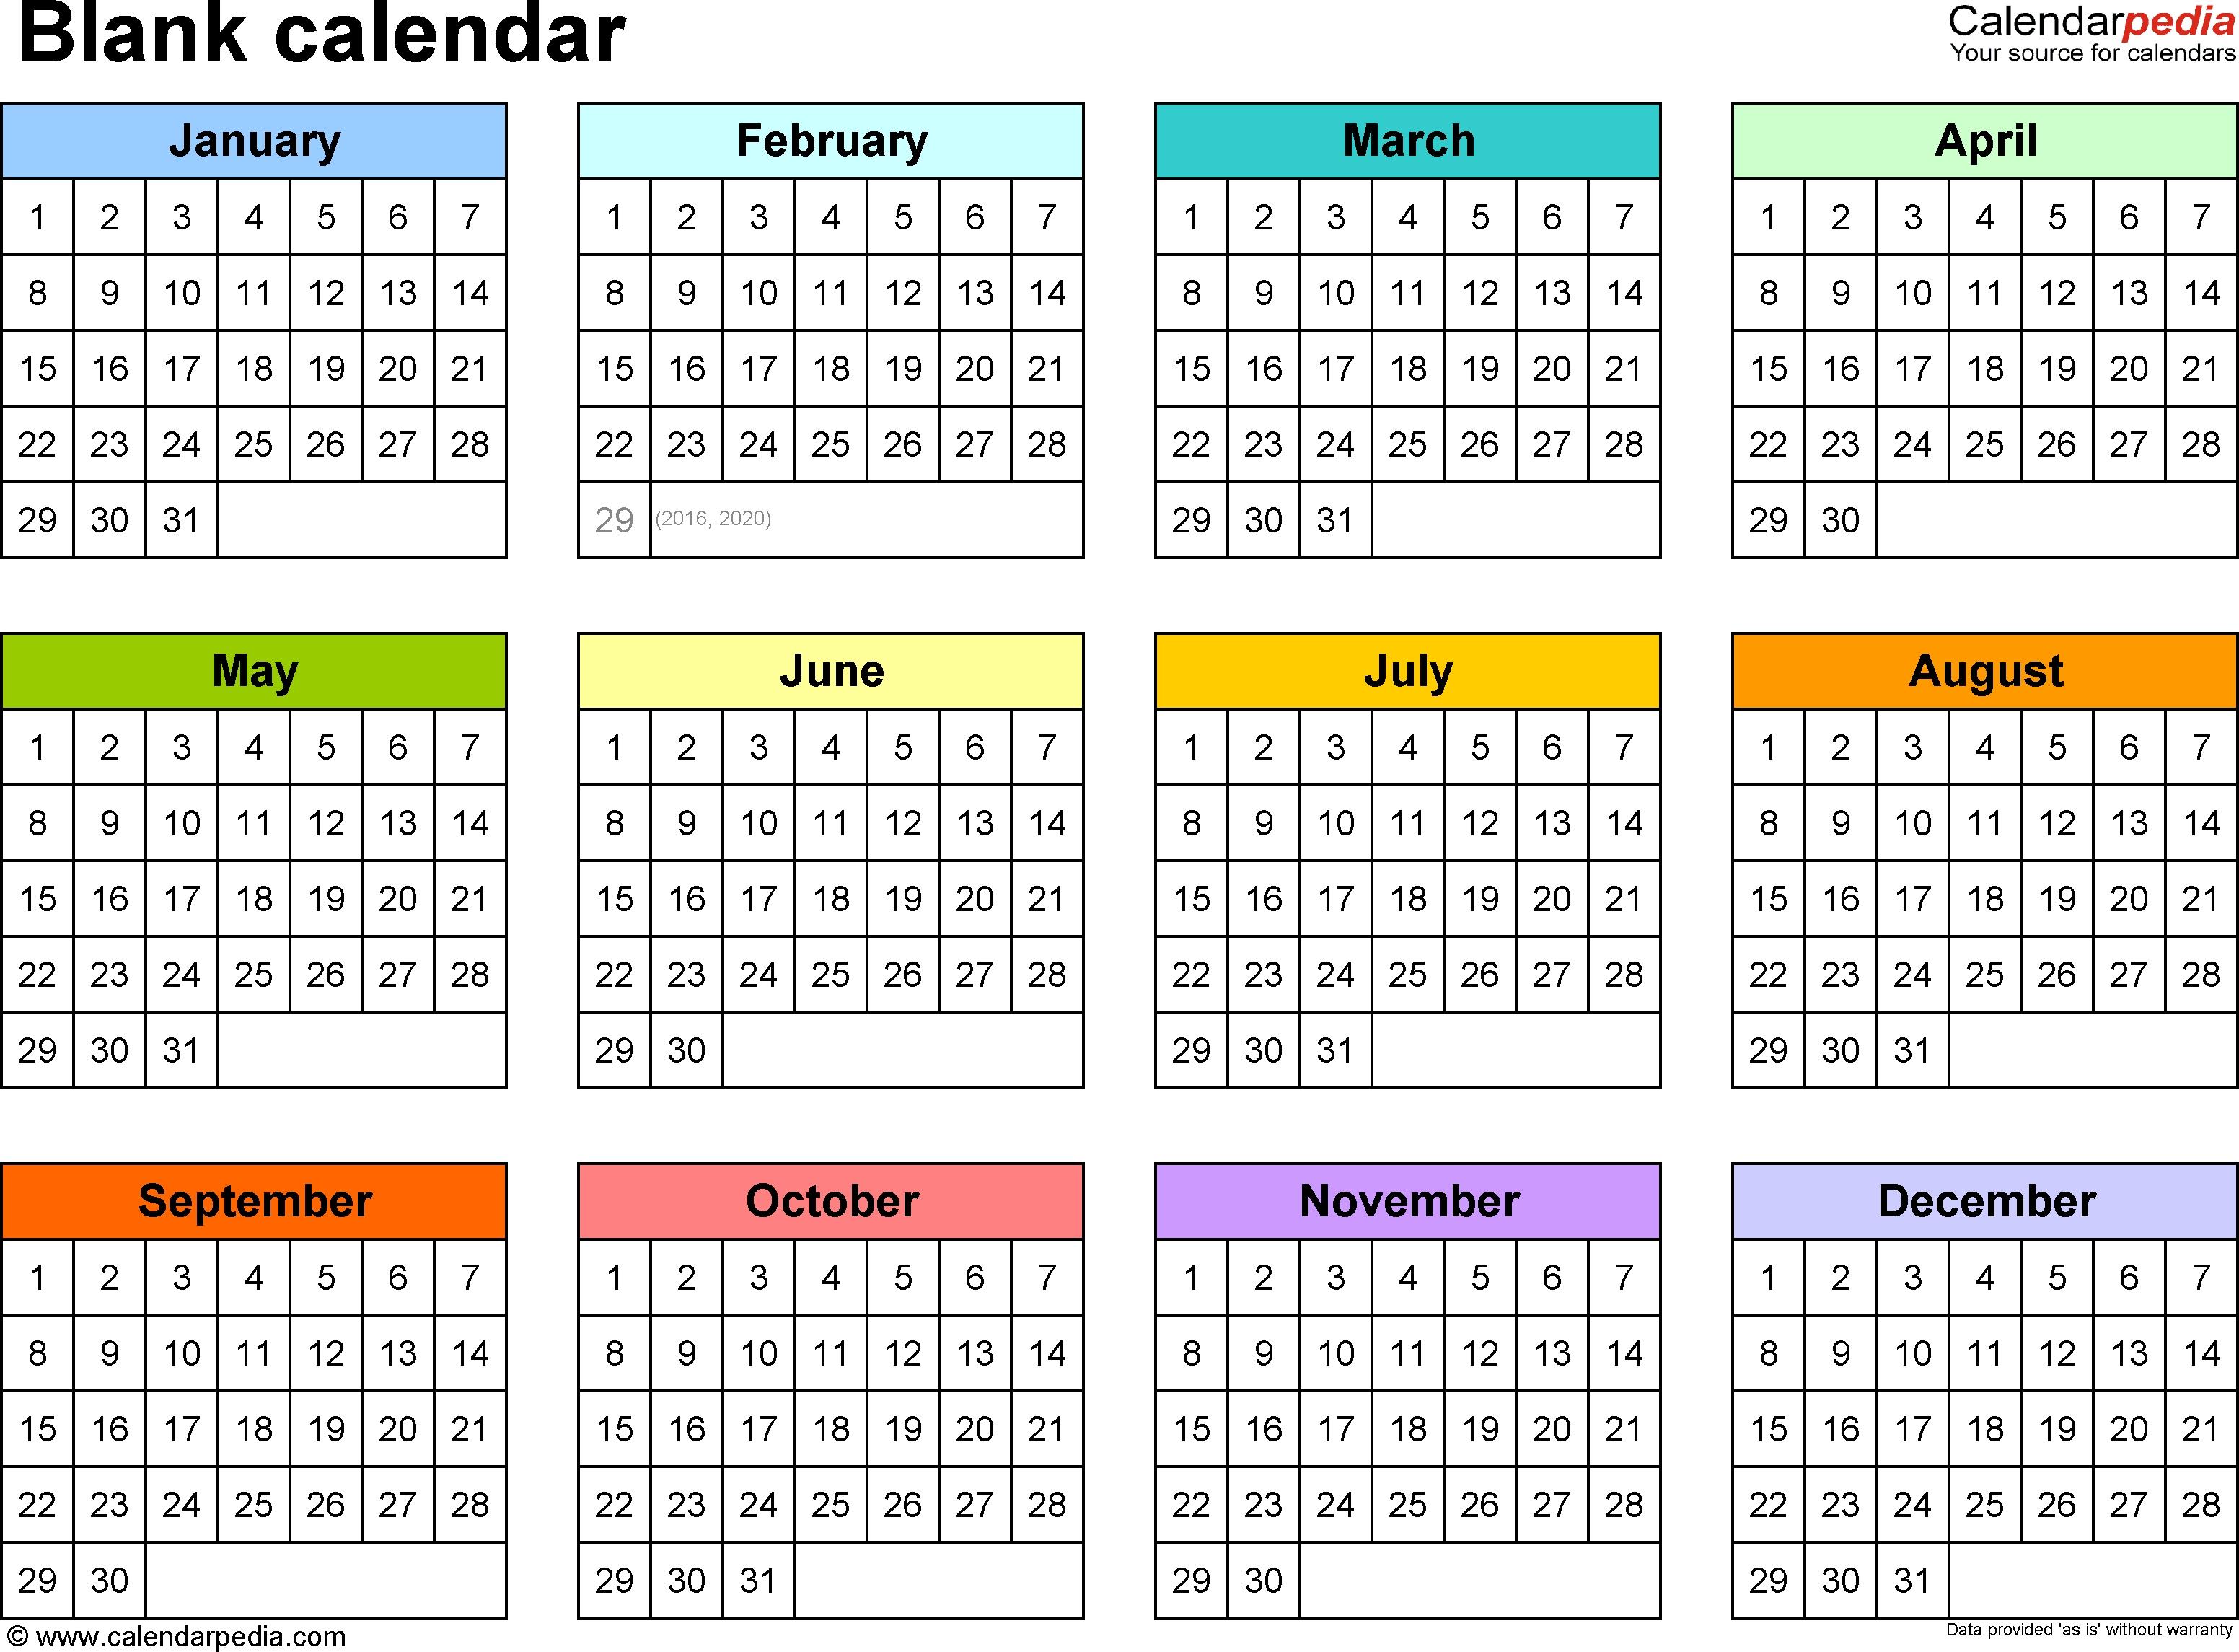 Blank Calendars - Free Printable Microsoft Word Templates